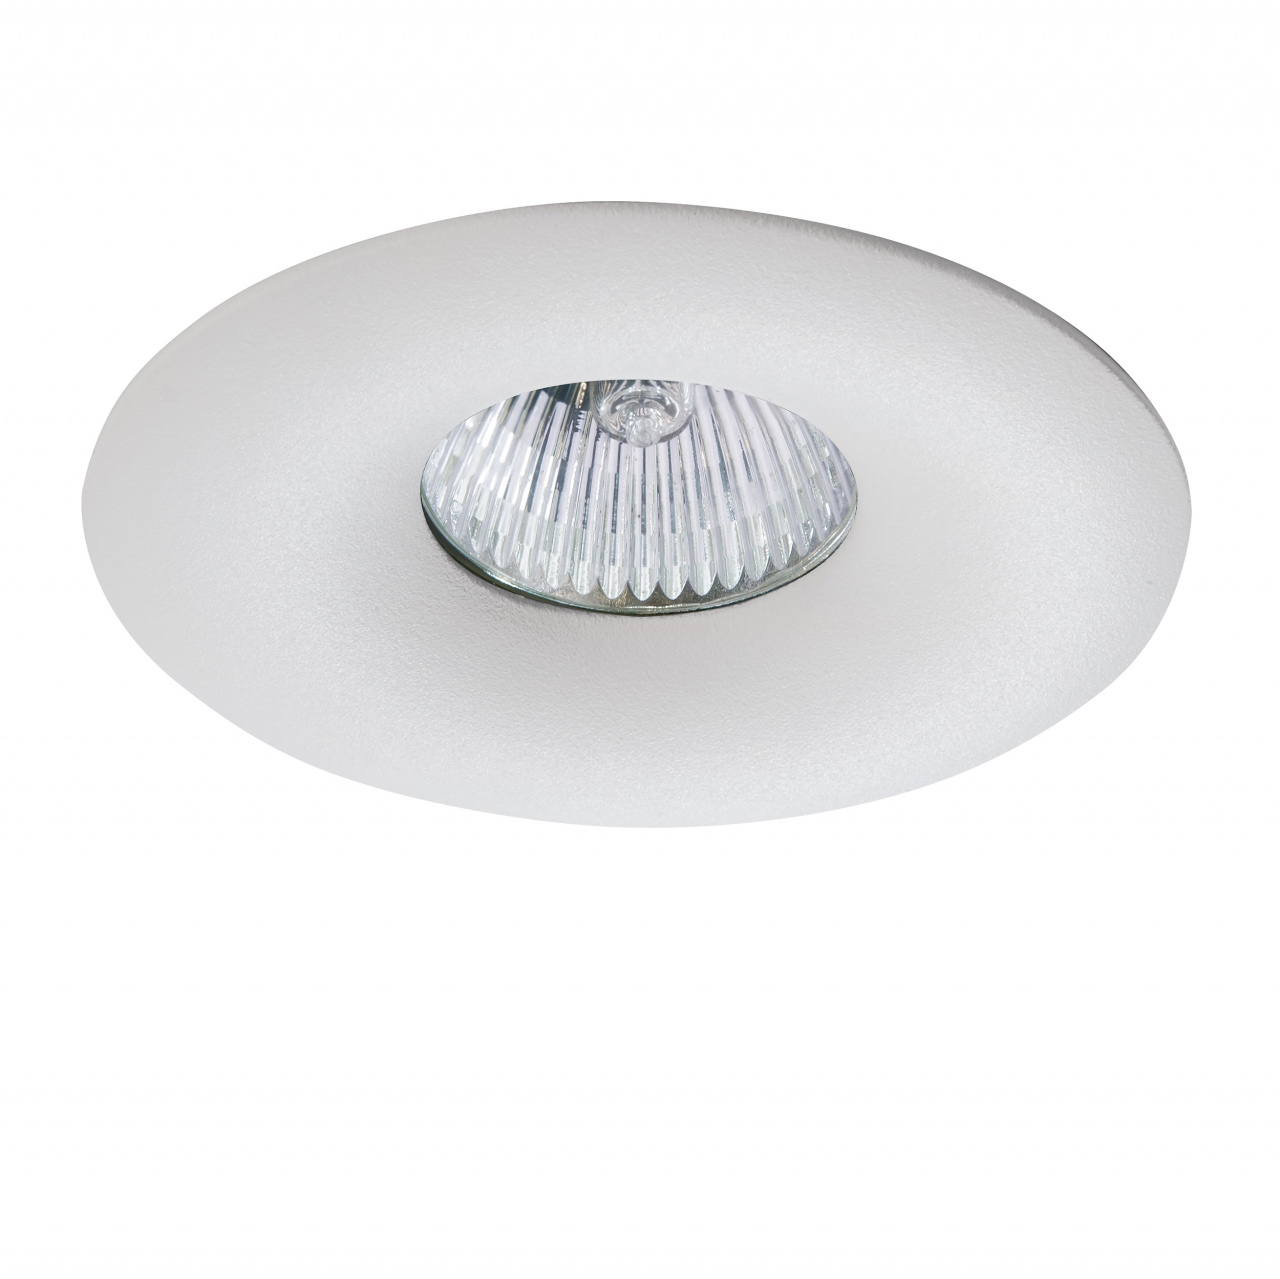 Светильник Levigo MR16 / HP16 белый Lightstar 010010